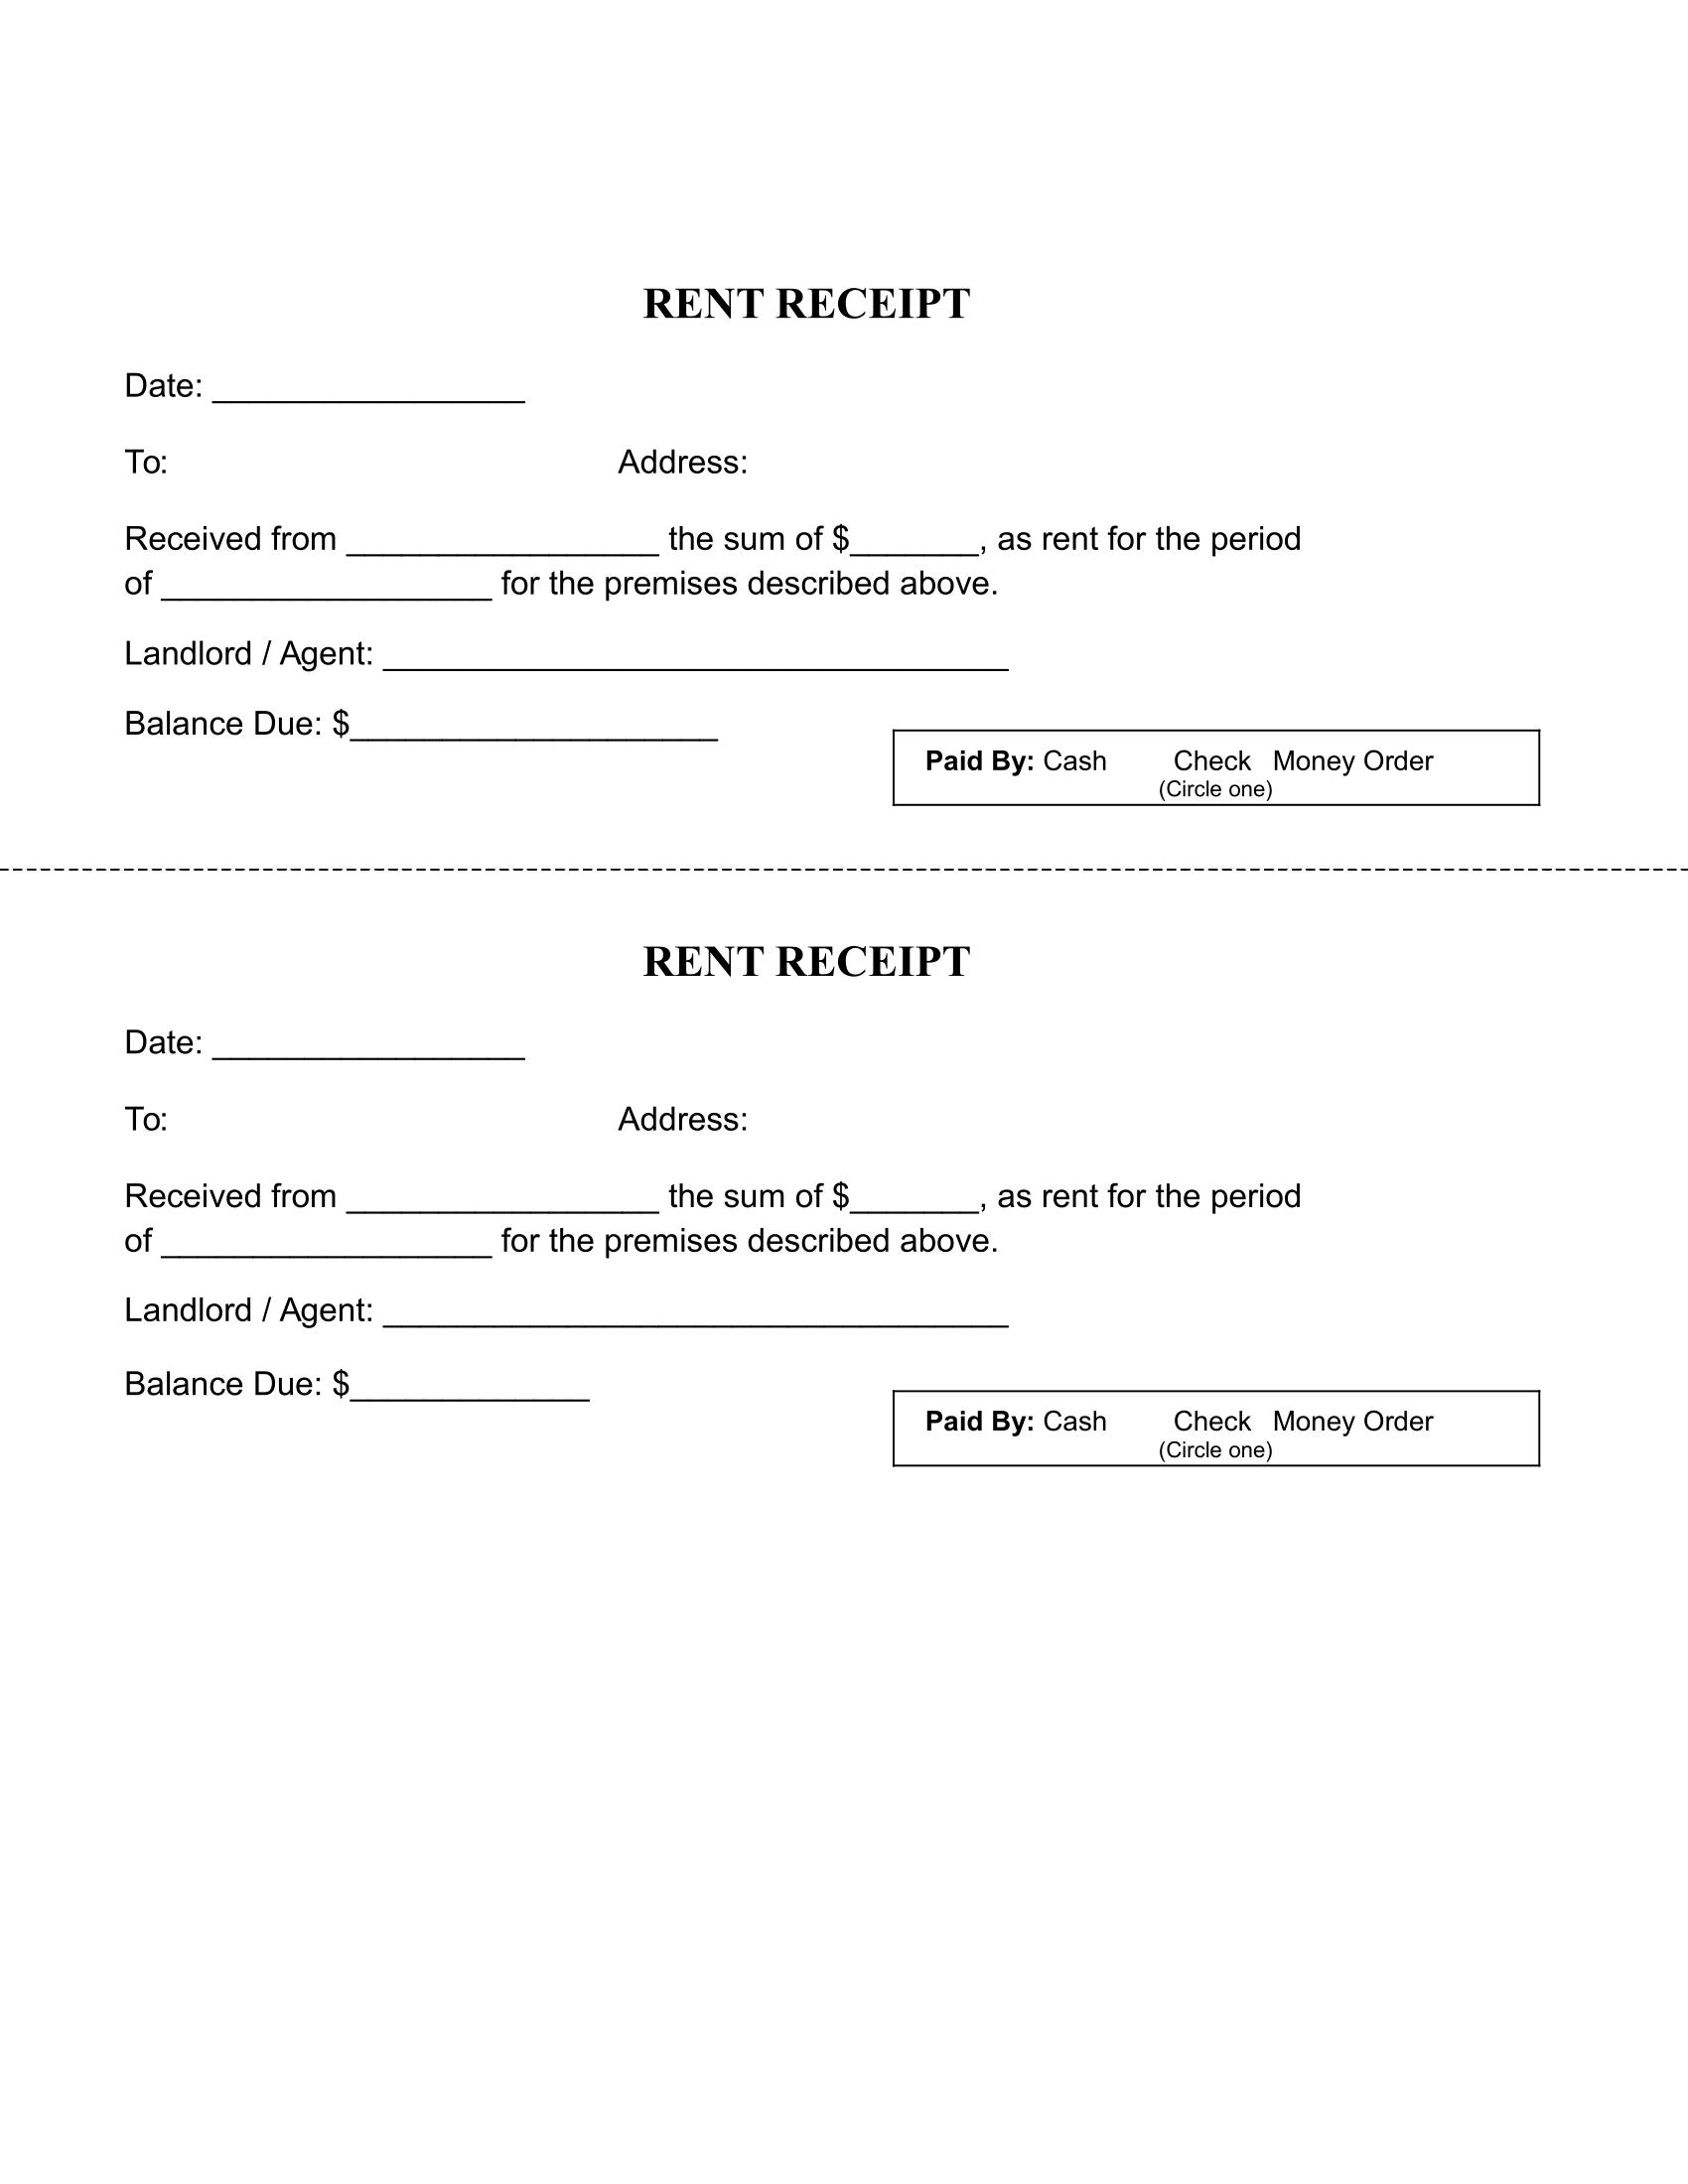 Unique Receipt Template Free Xls Xlsformat Xlstemplates Xlstemplate Check More At Https Mavensoci Receipt Template Business Letter Template Template Free